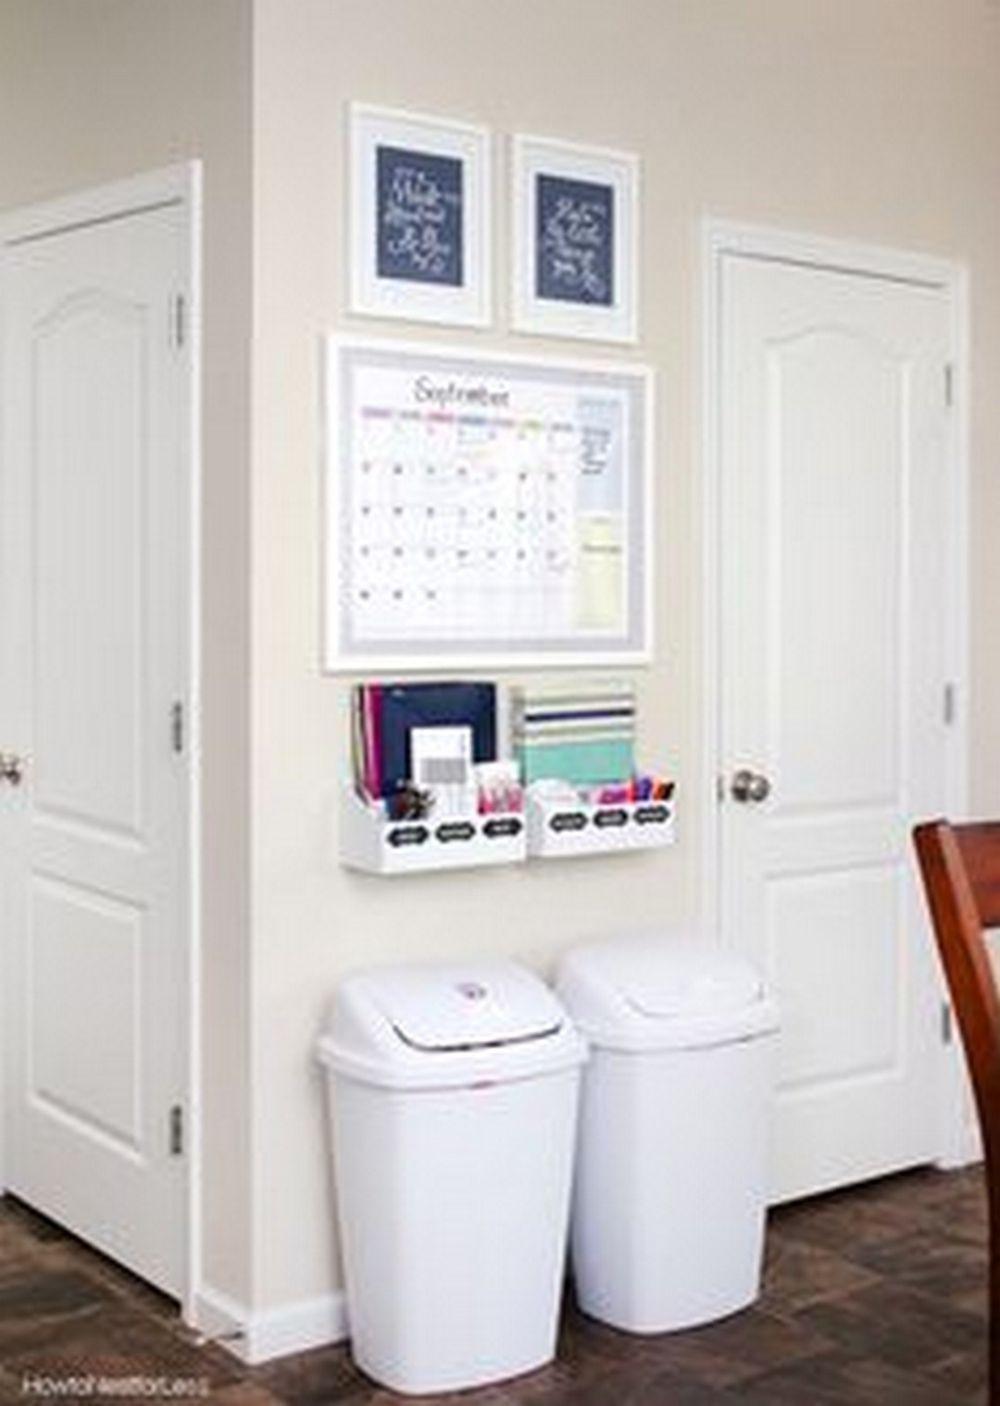 30 creative college apartment decorating ideas | nice, creative